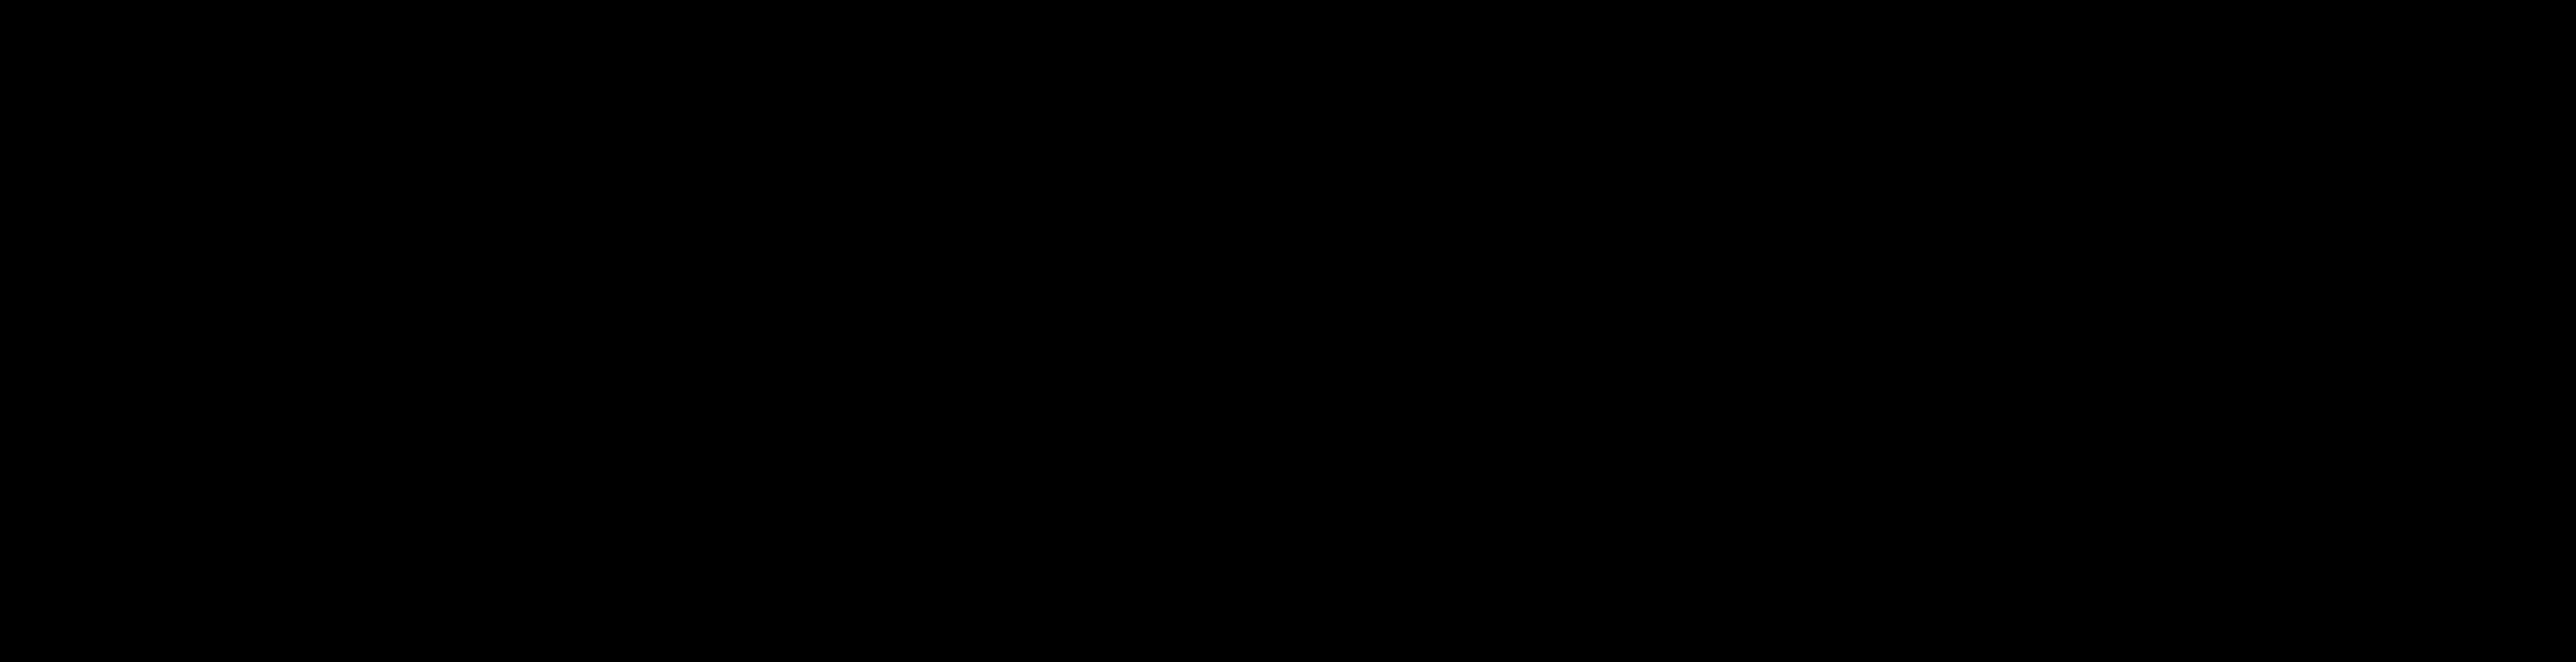 Jung – Logos Download